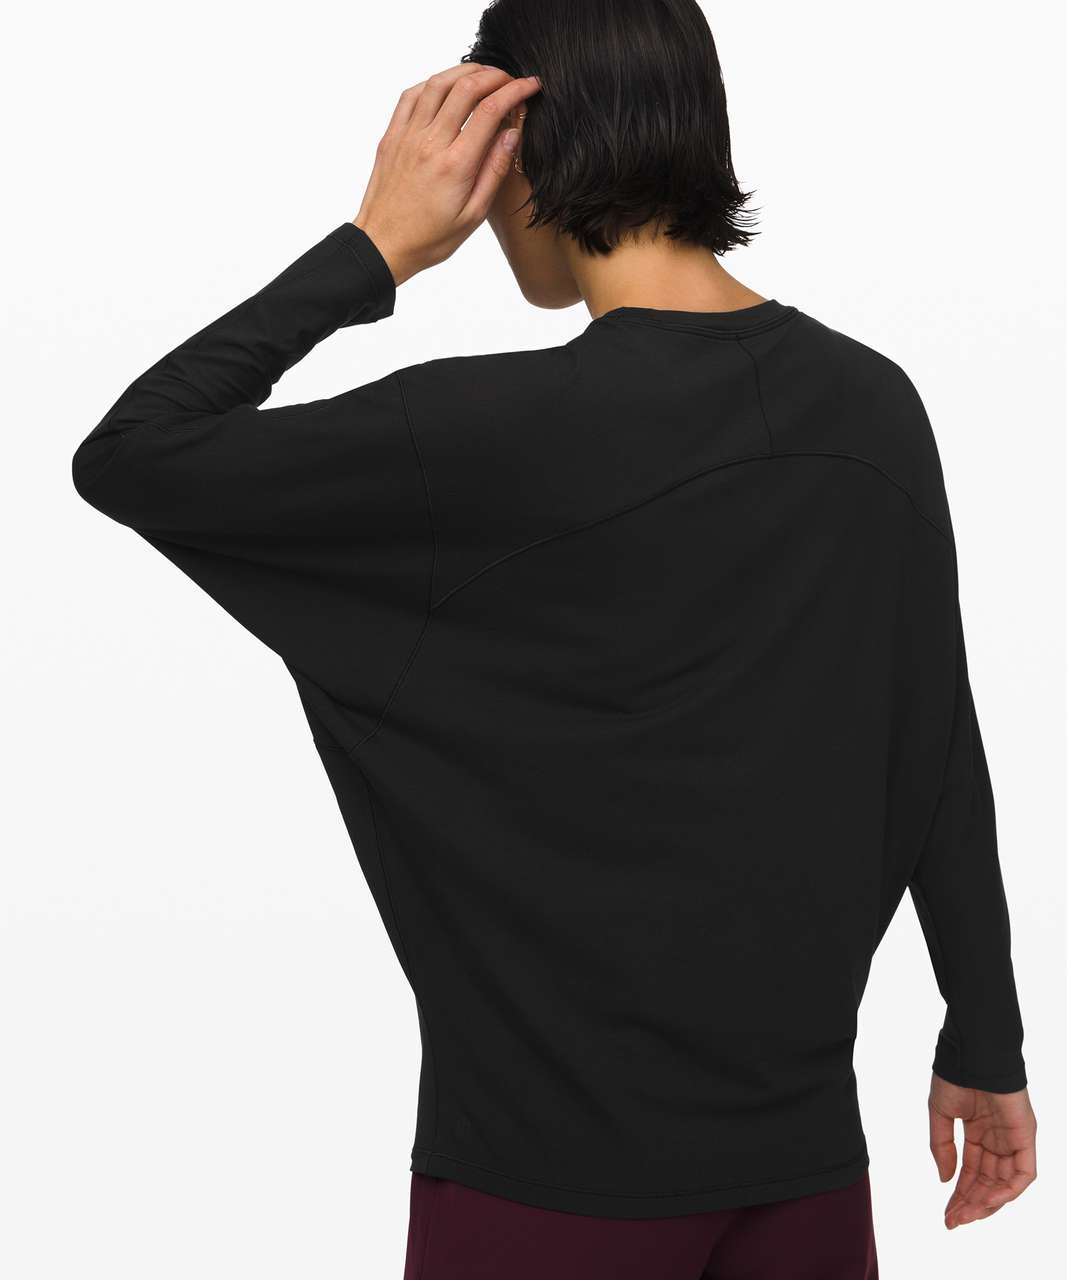 Lululemon Loungeful Drape Long Sleeve - Black